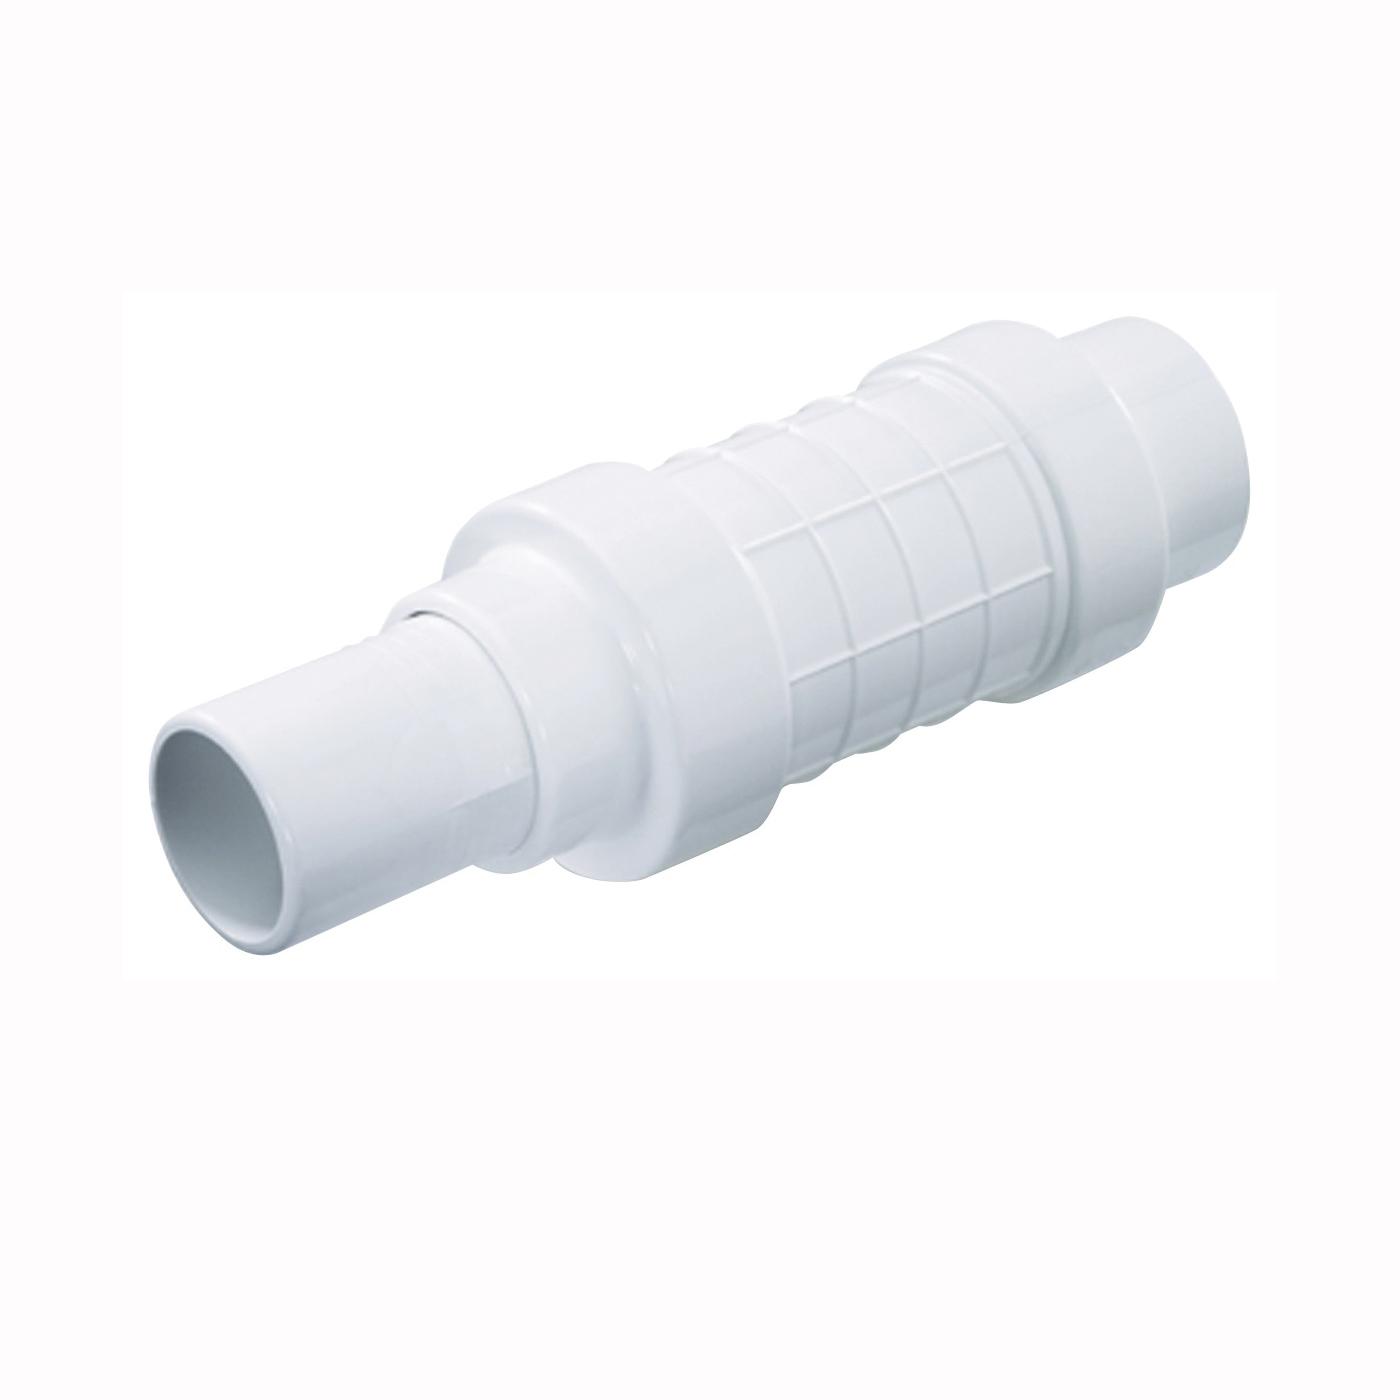 Picture of NDS Quik-Fix QF-1000 Pipe Repair Coupler, 1 in, Socket x Spigot, White, SCH 40 Schedule, 150 psi Pressure